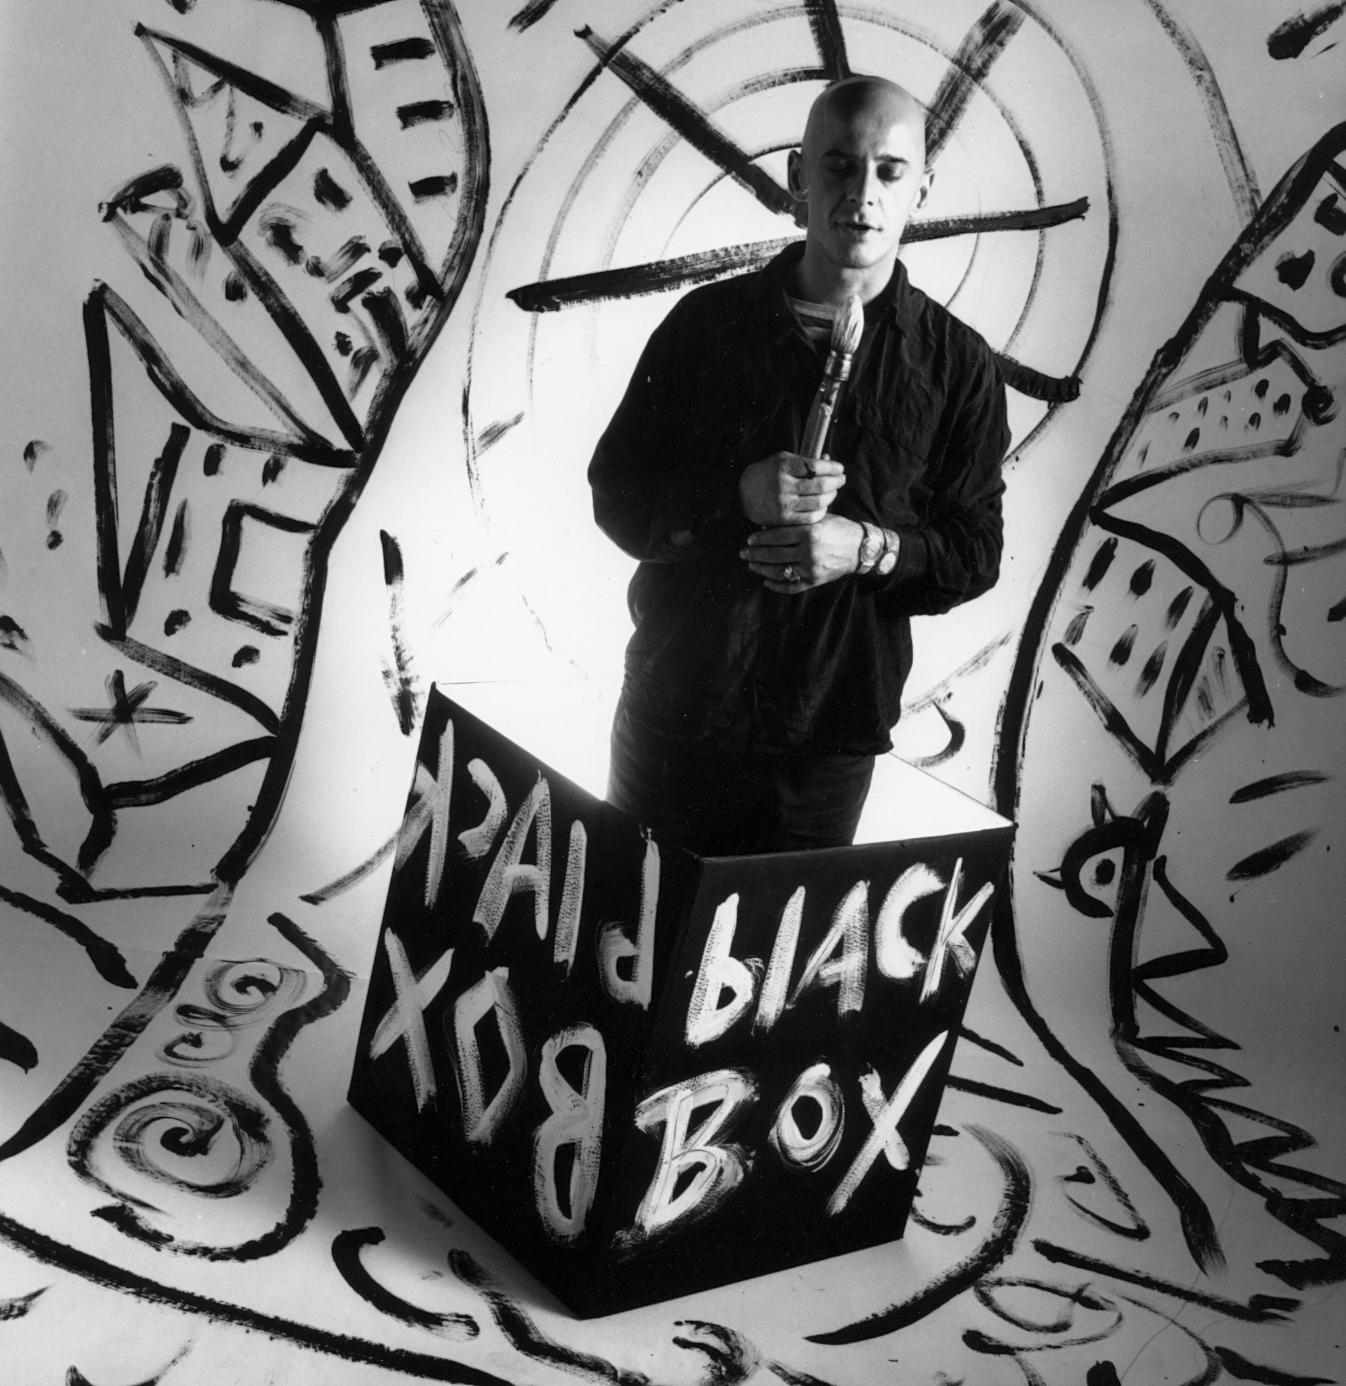 blackboxkiddy.jpg